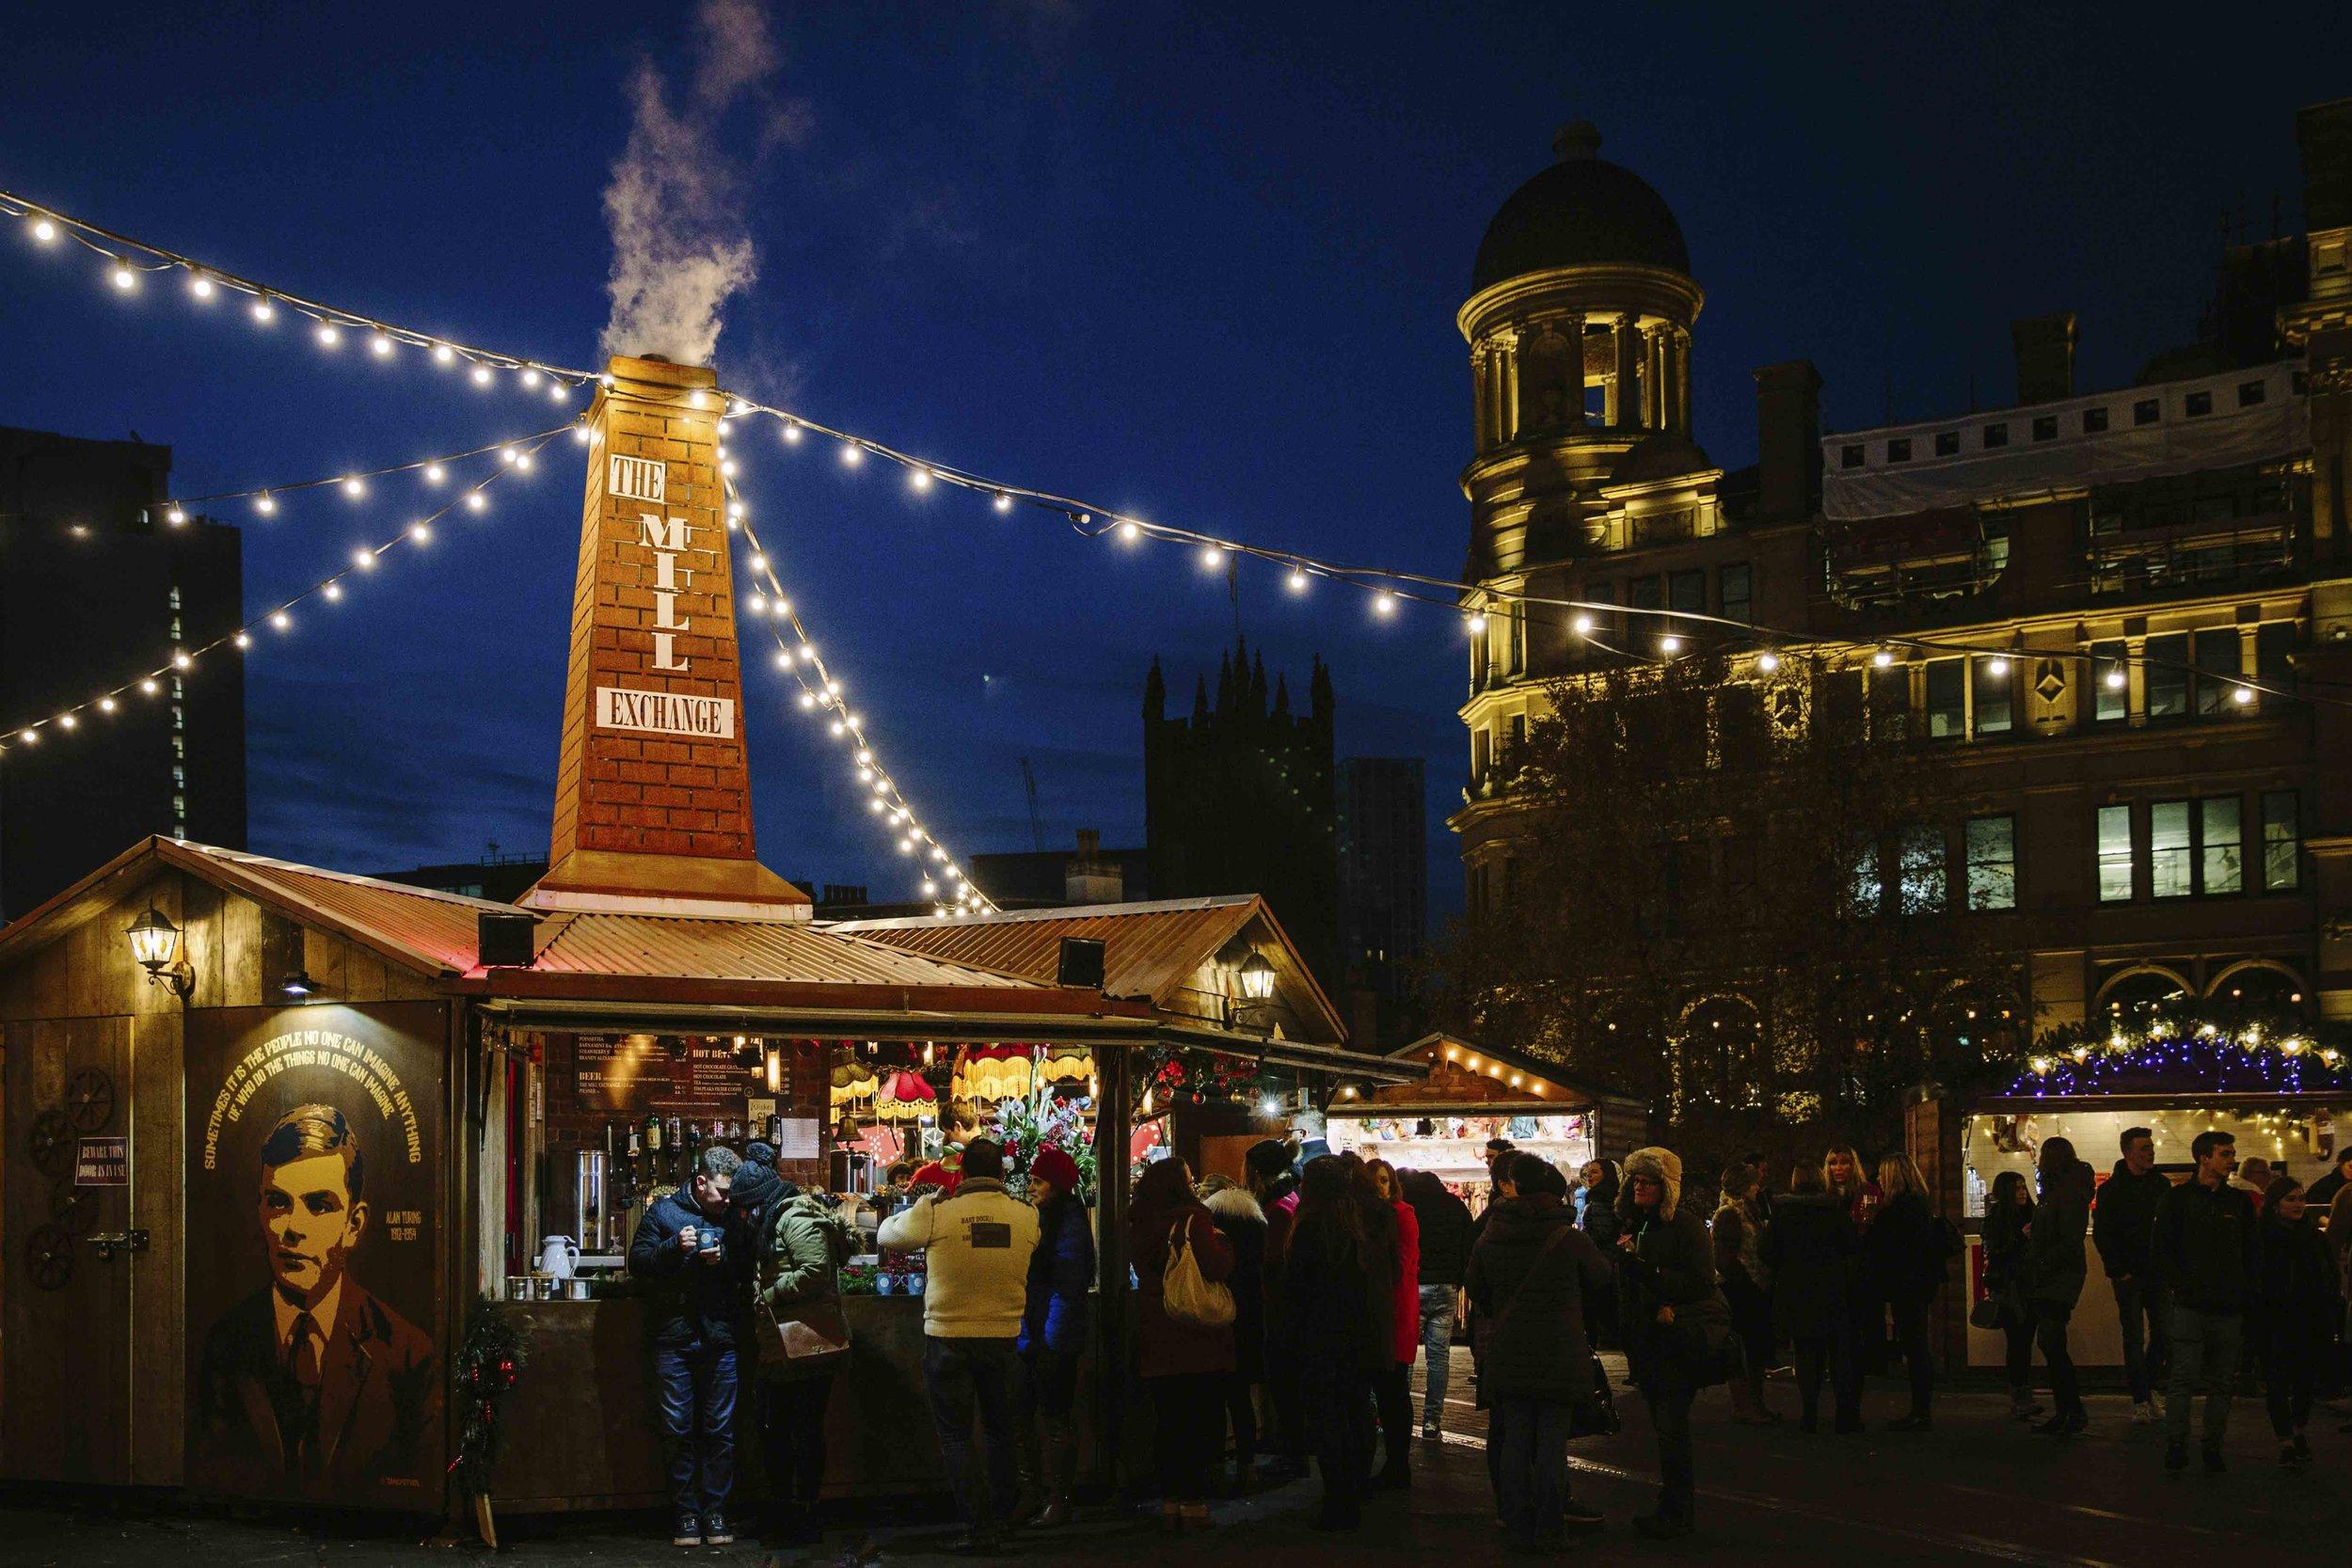 DP_Structures_Manchester_Christmas_Markets_2016_10.jpg